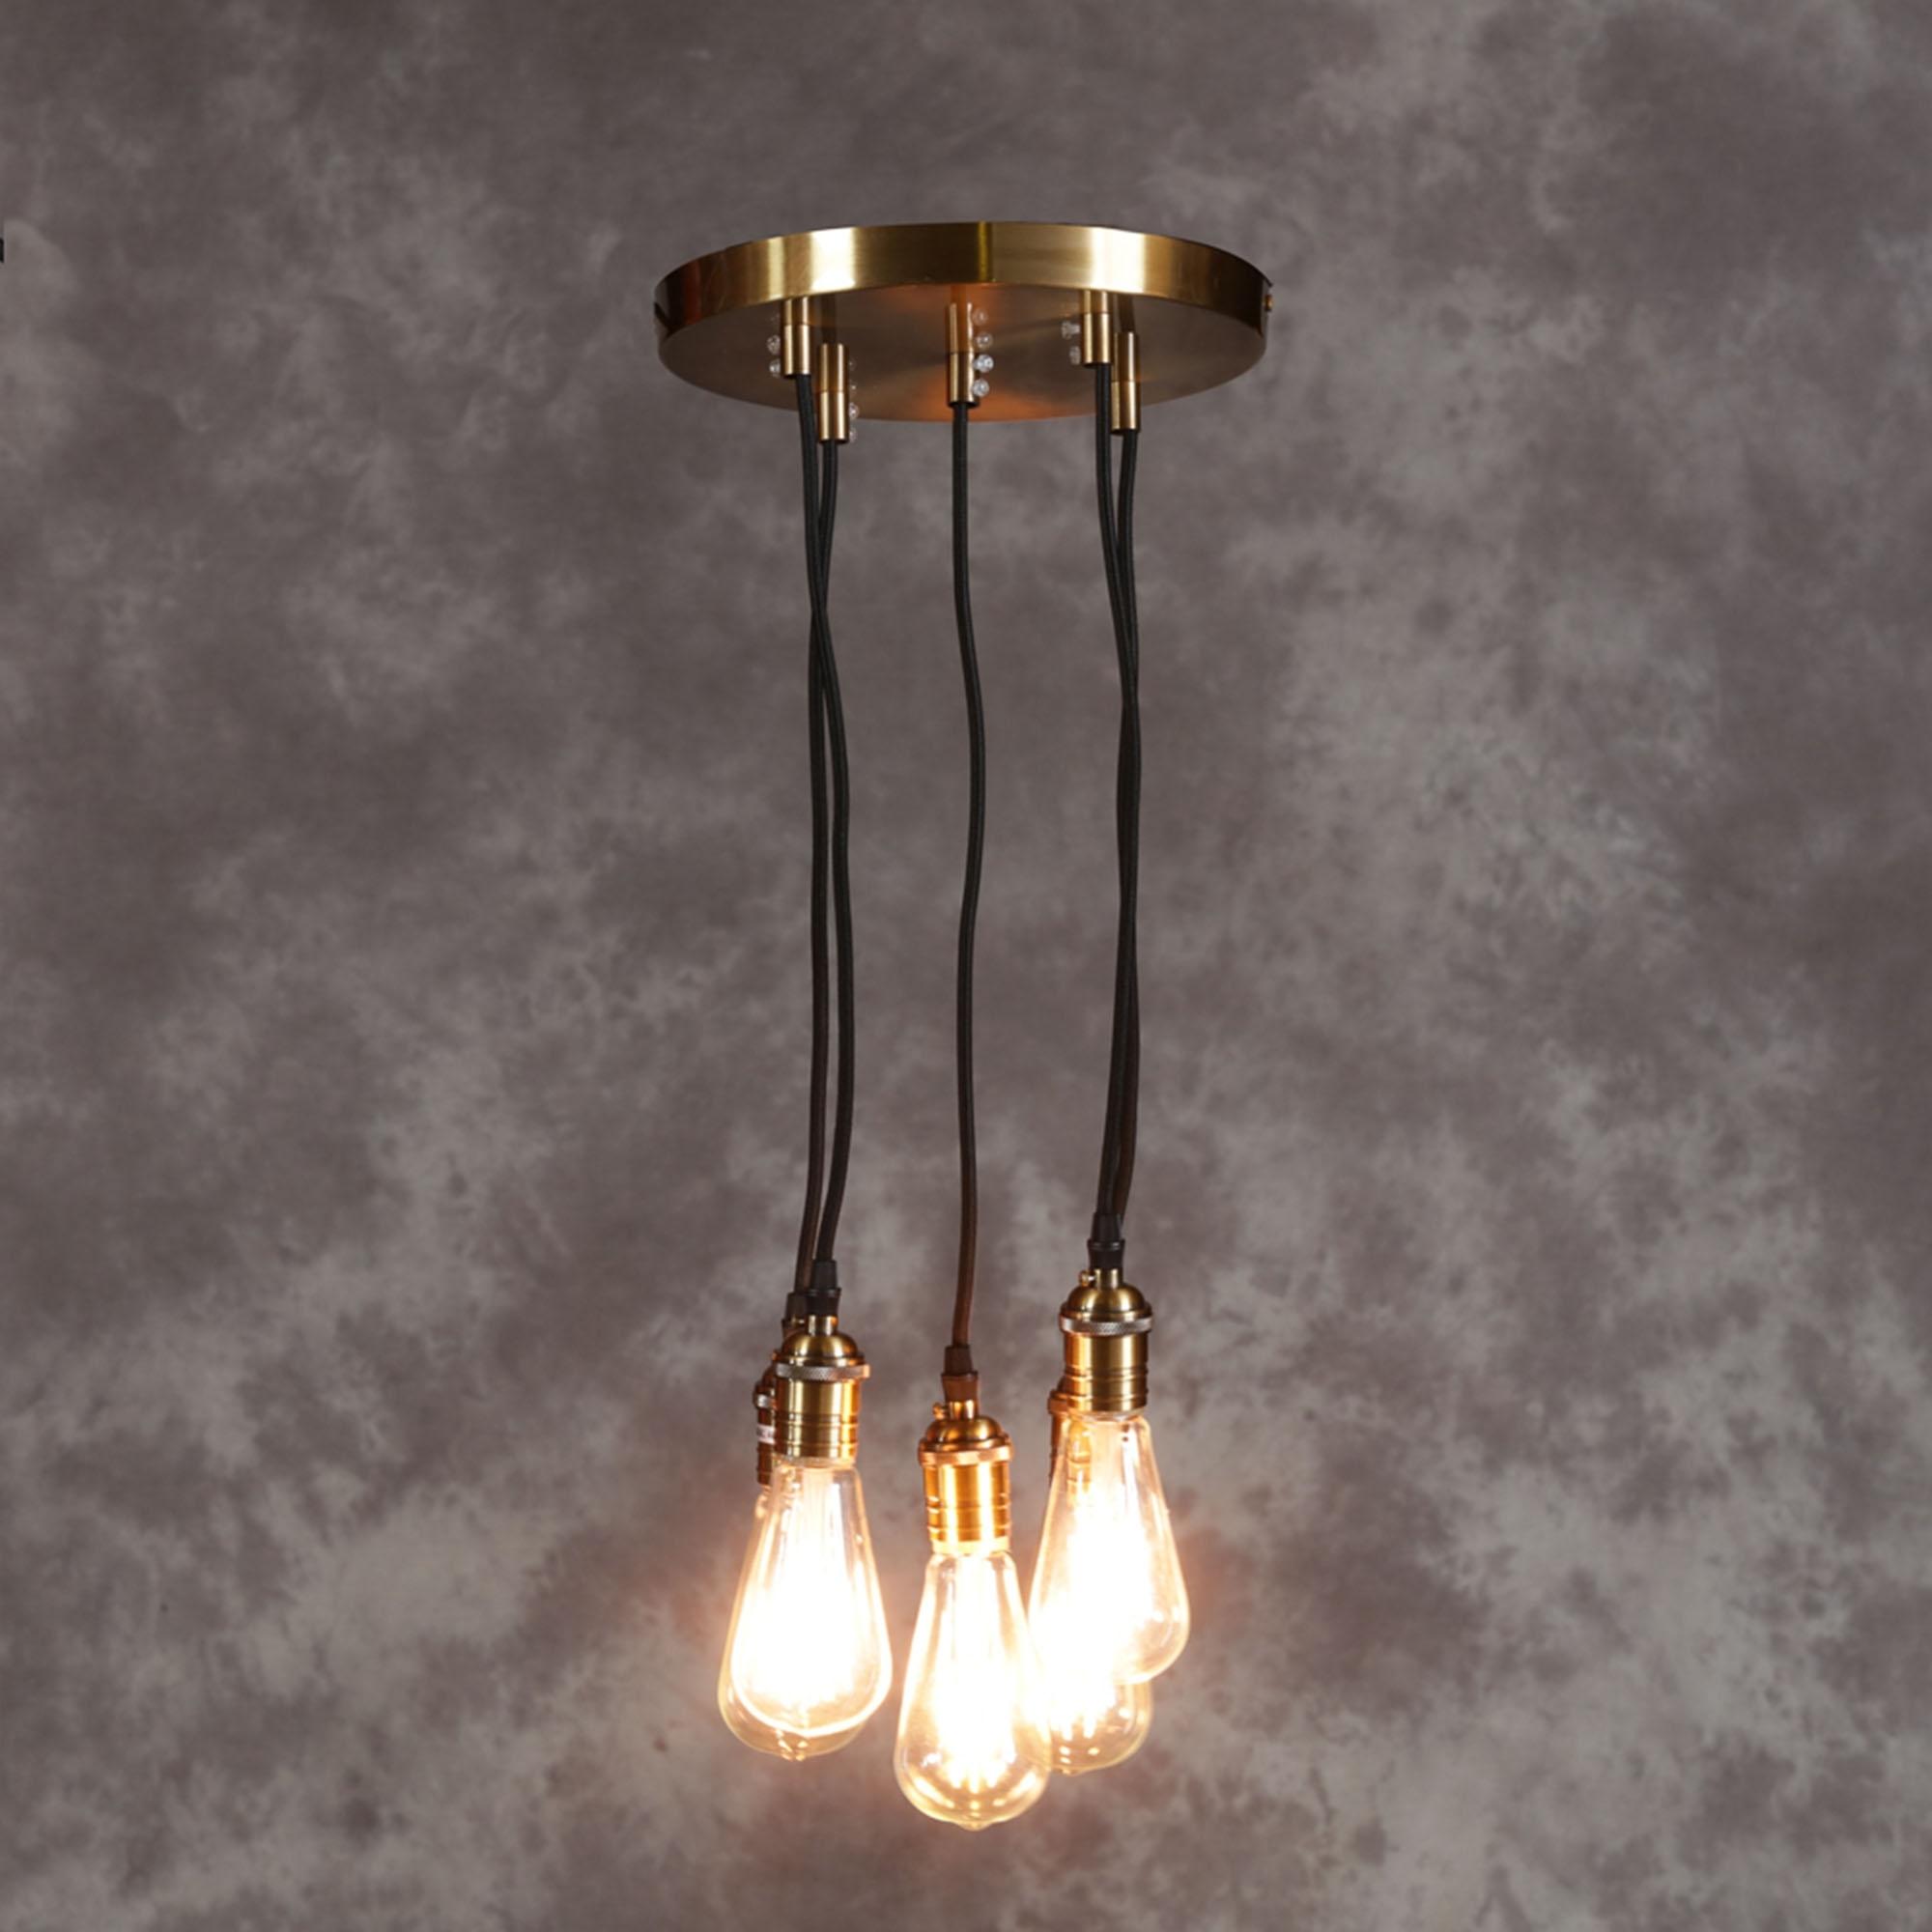 Vintage Brass Multi Pendant Light French Lighting from